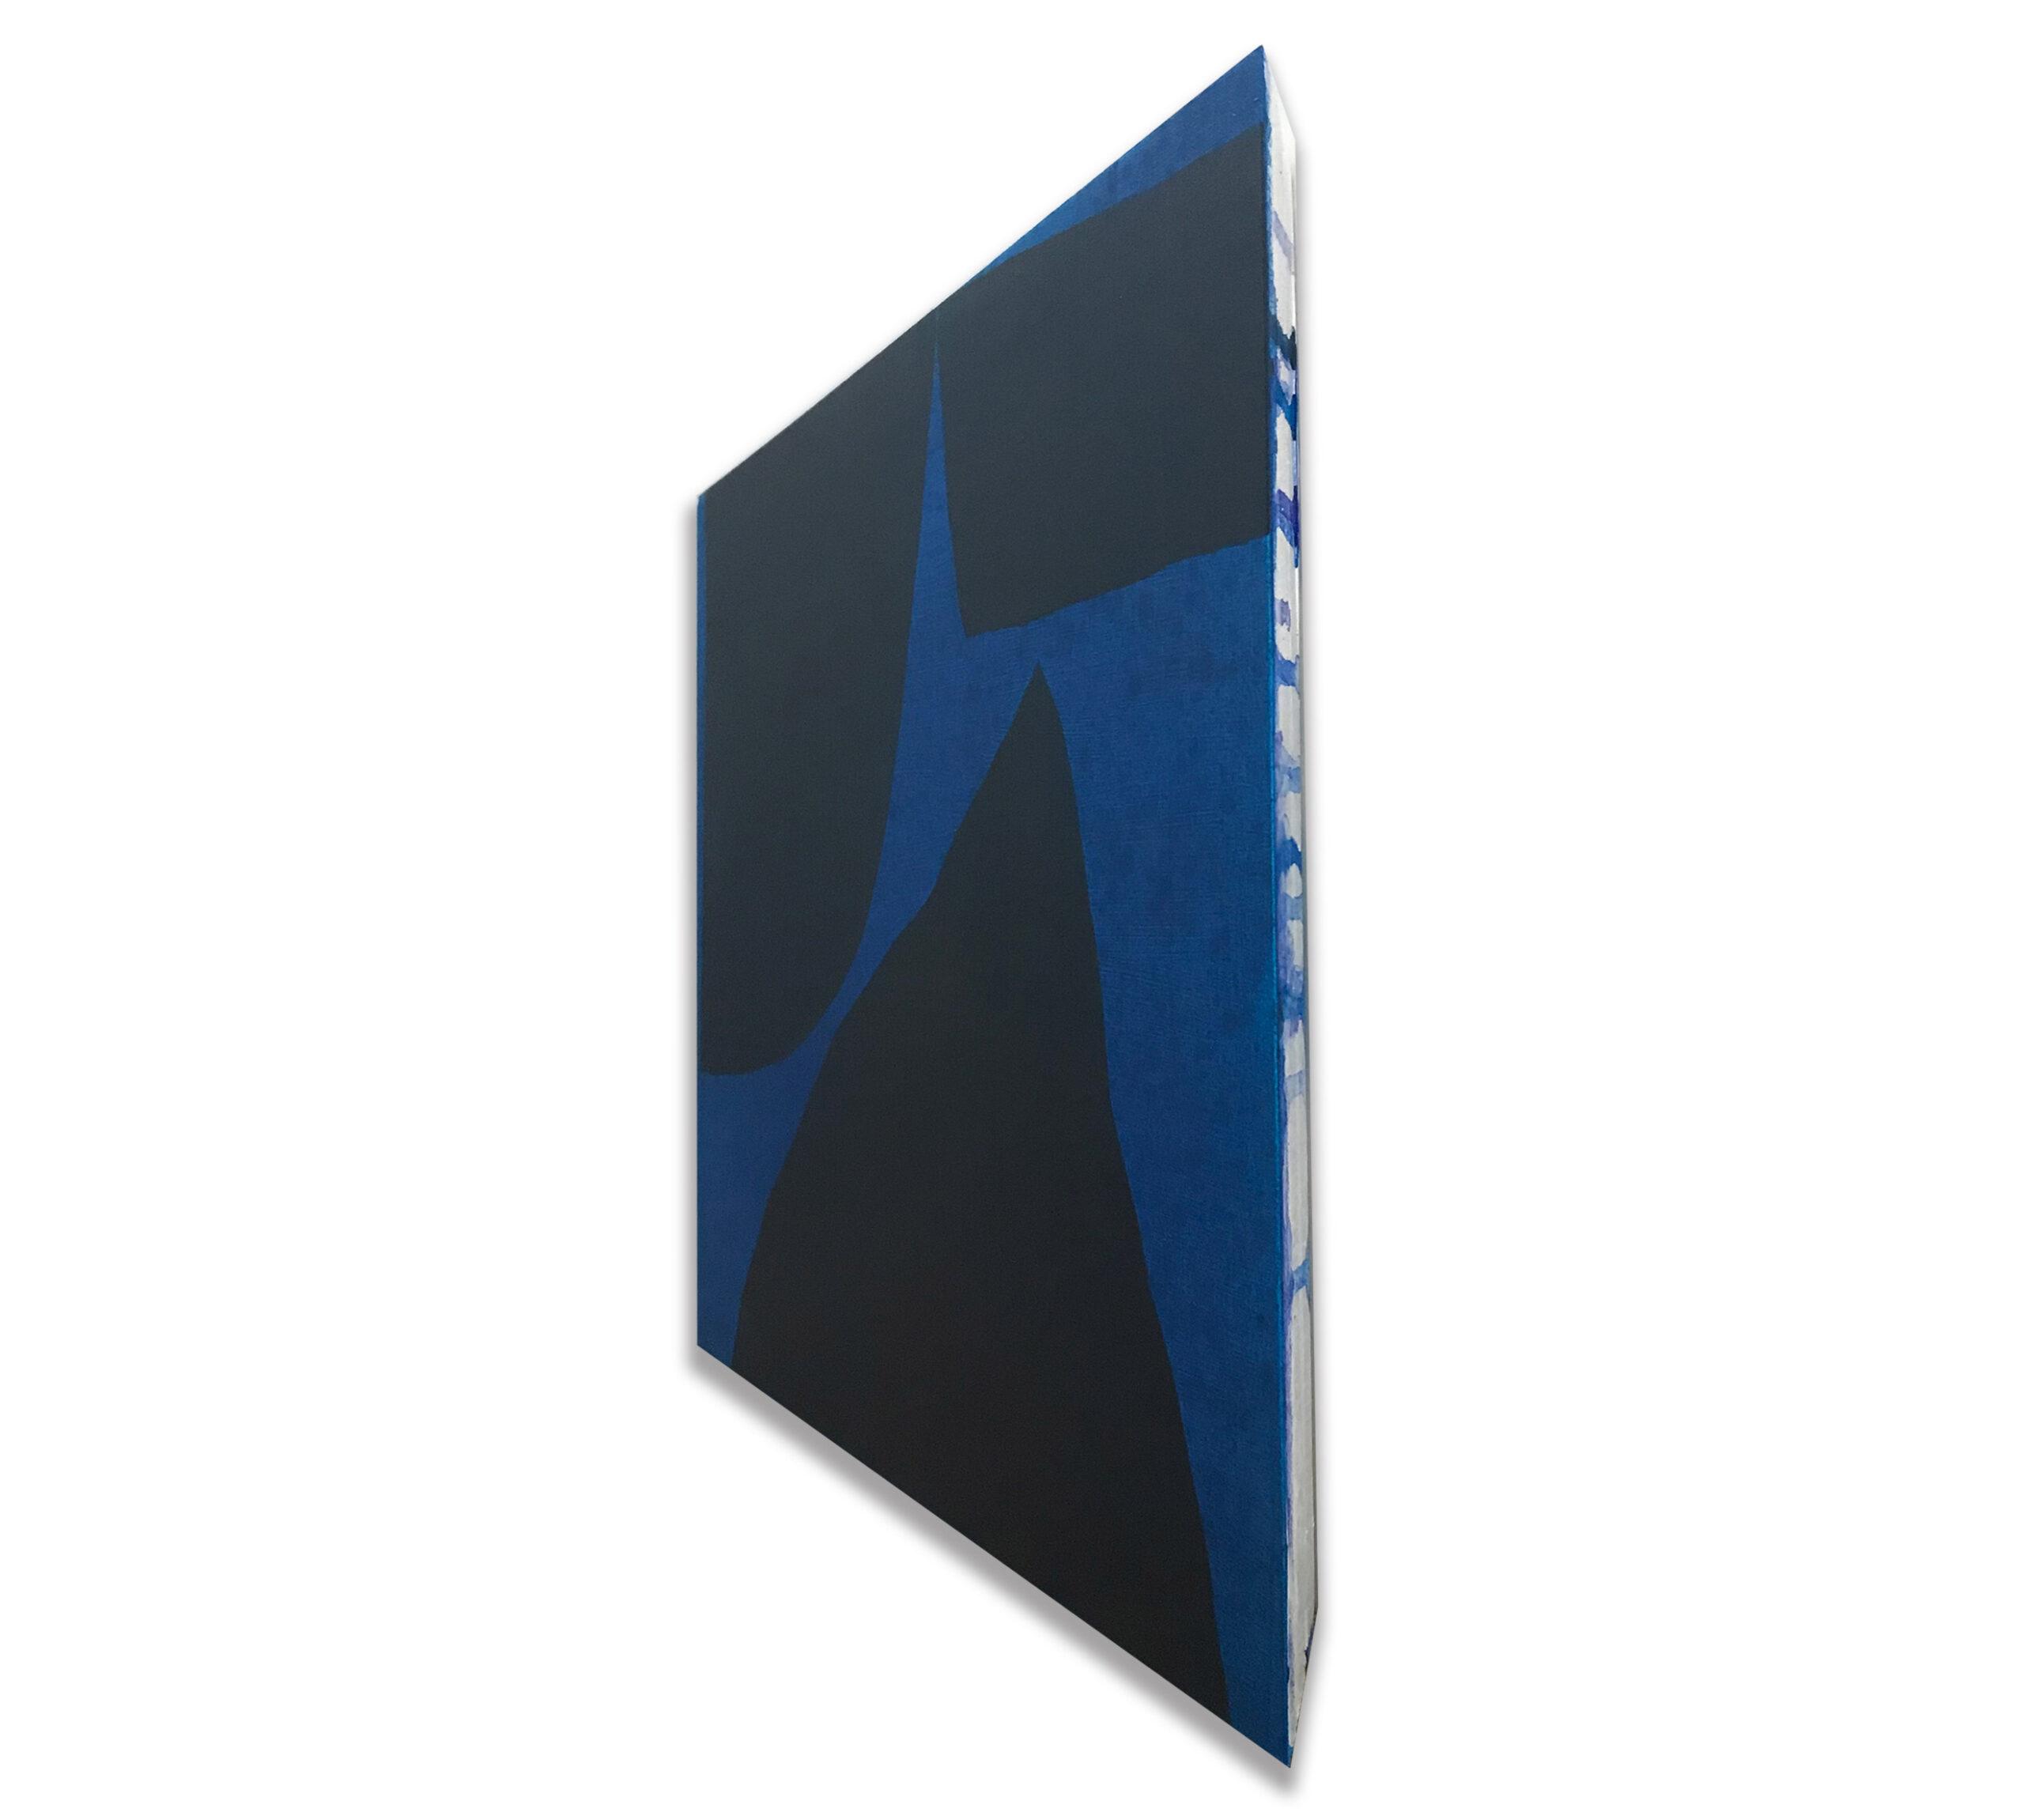 Jack Killick: Drop (2020) Acrylic on board (31.5cm x 36.5cm x 5cm) detail